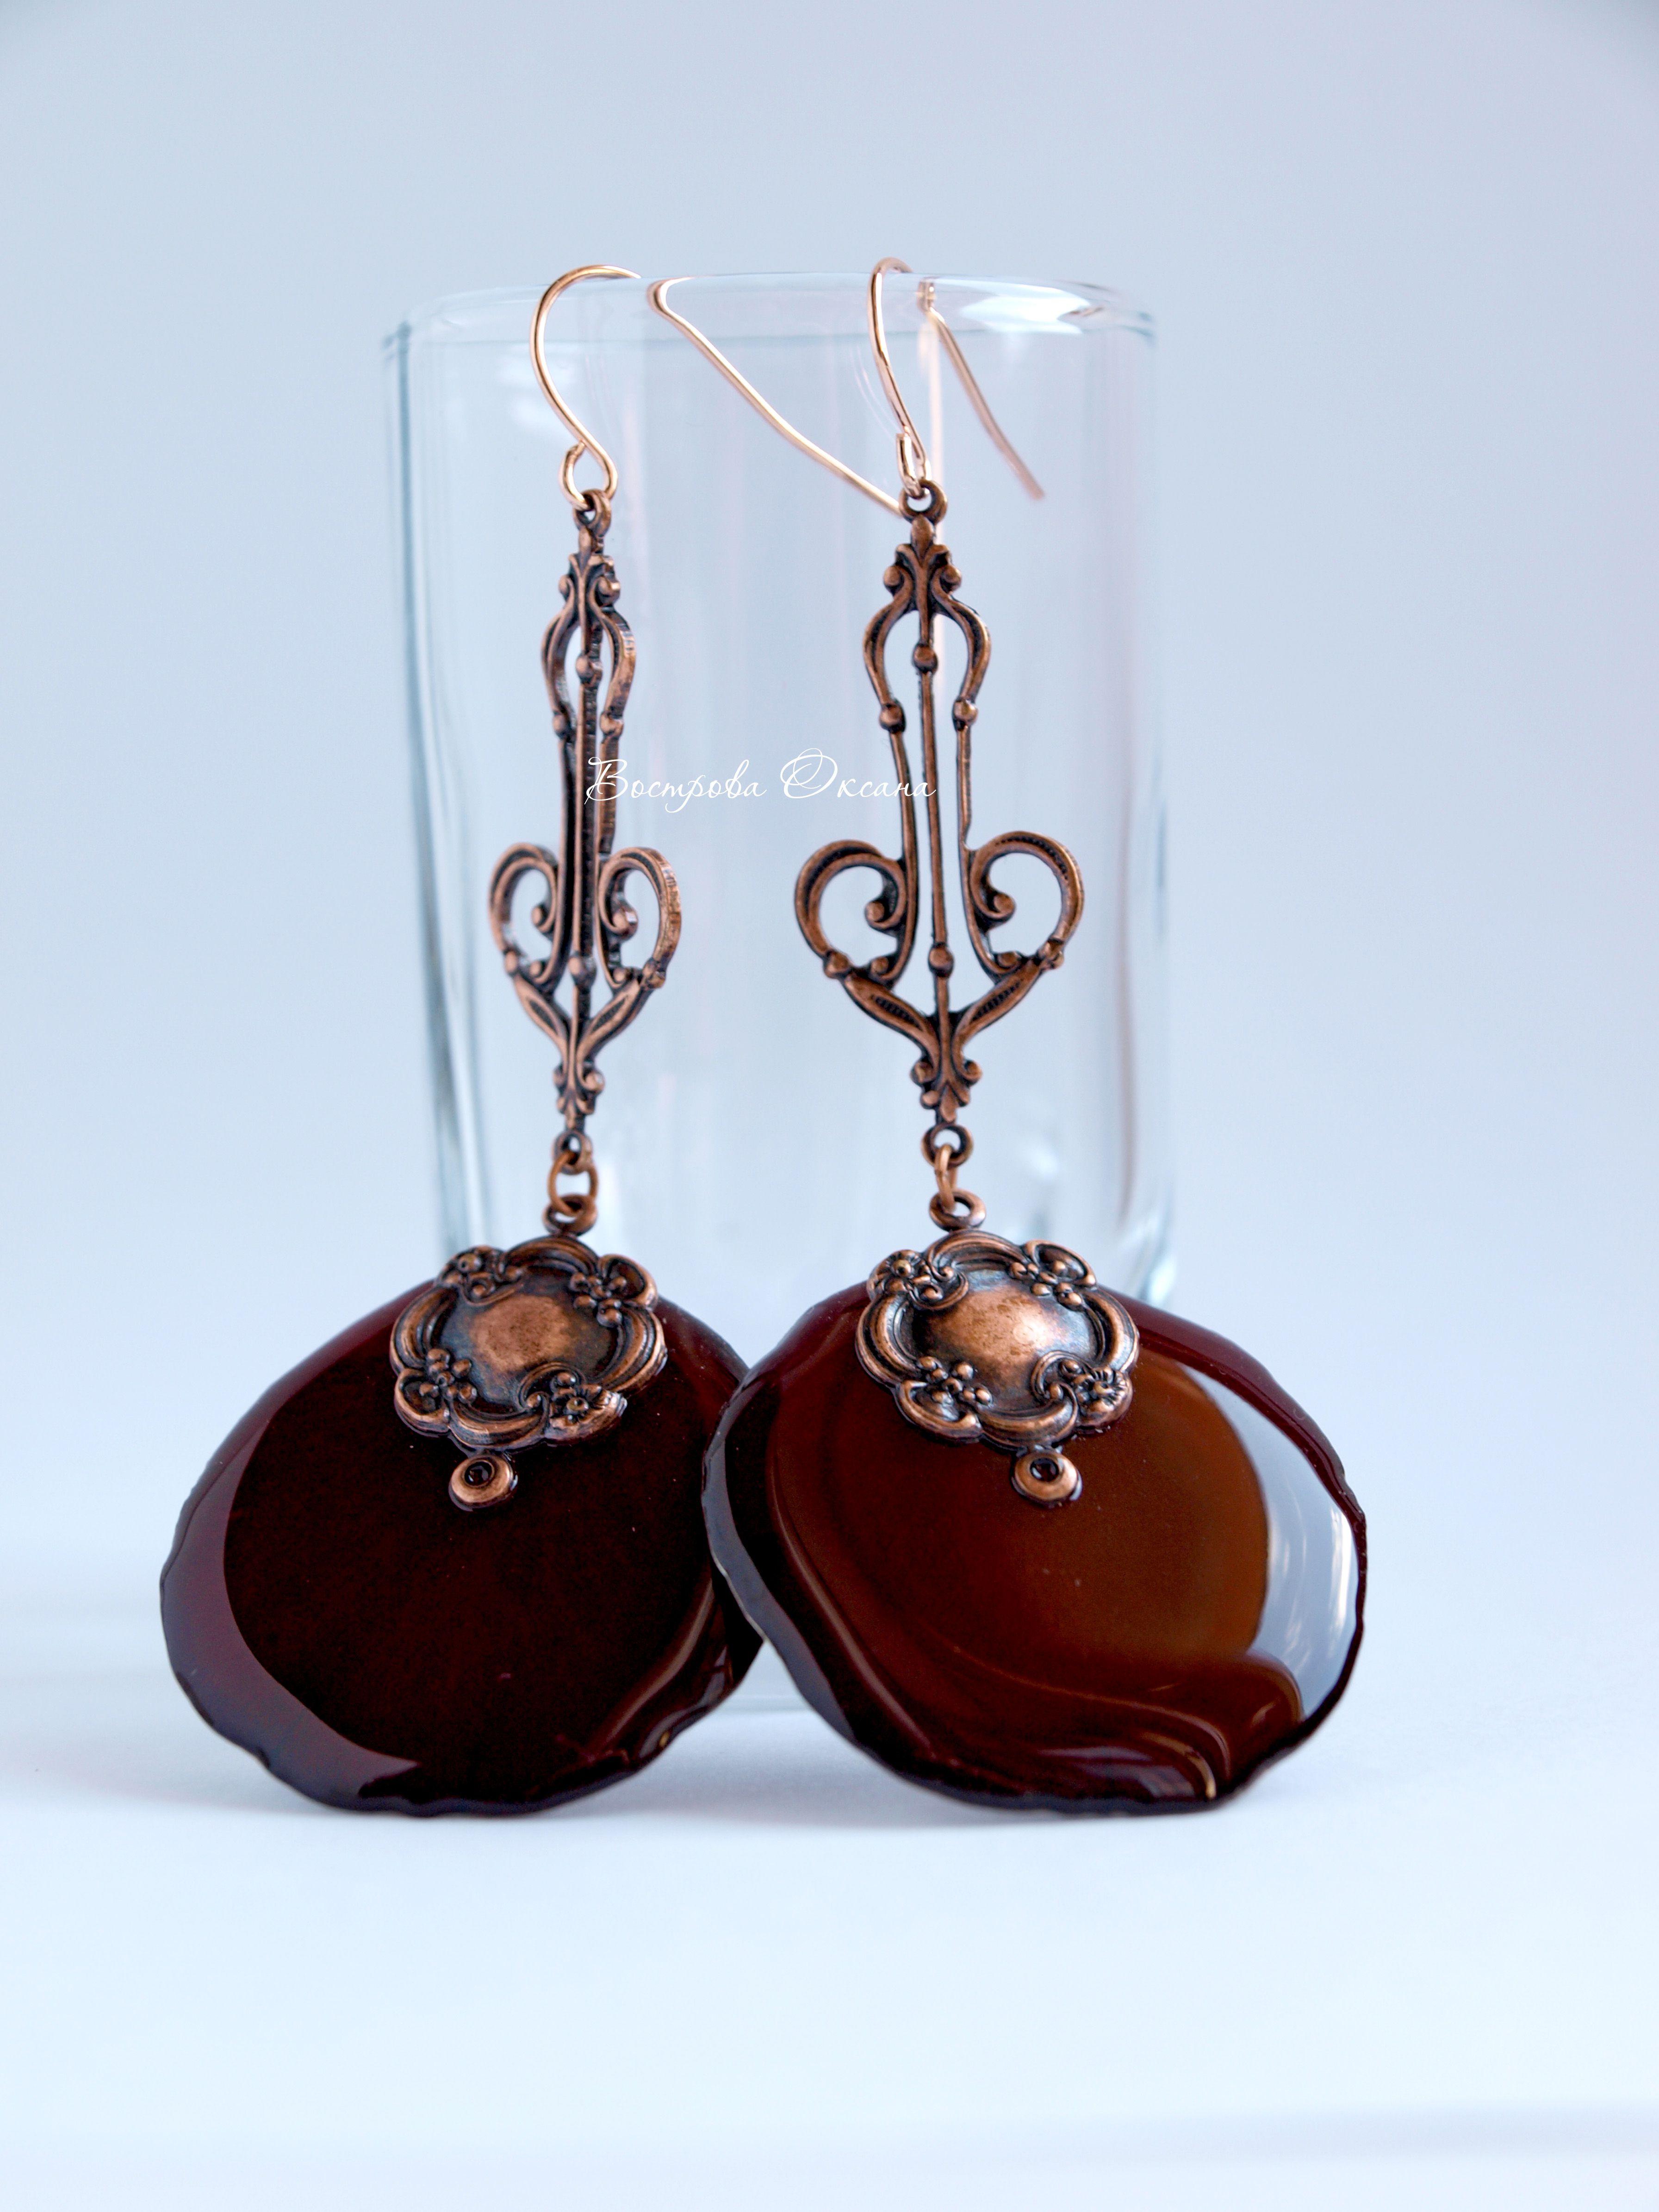 handmade rosepetals eardrops earring